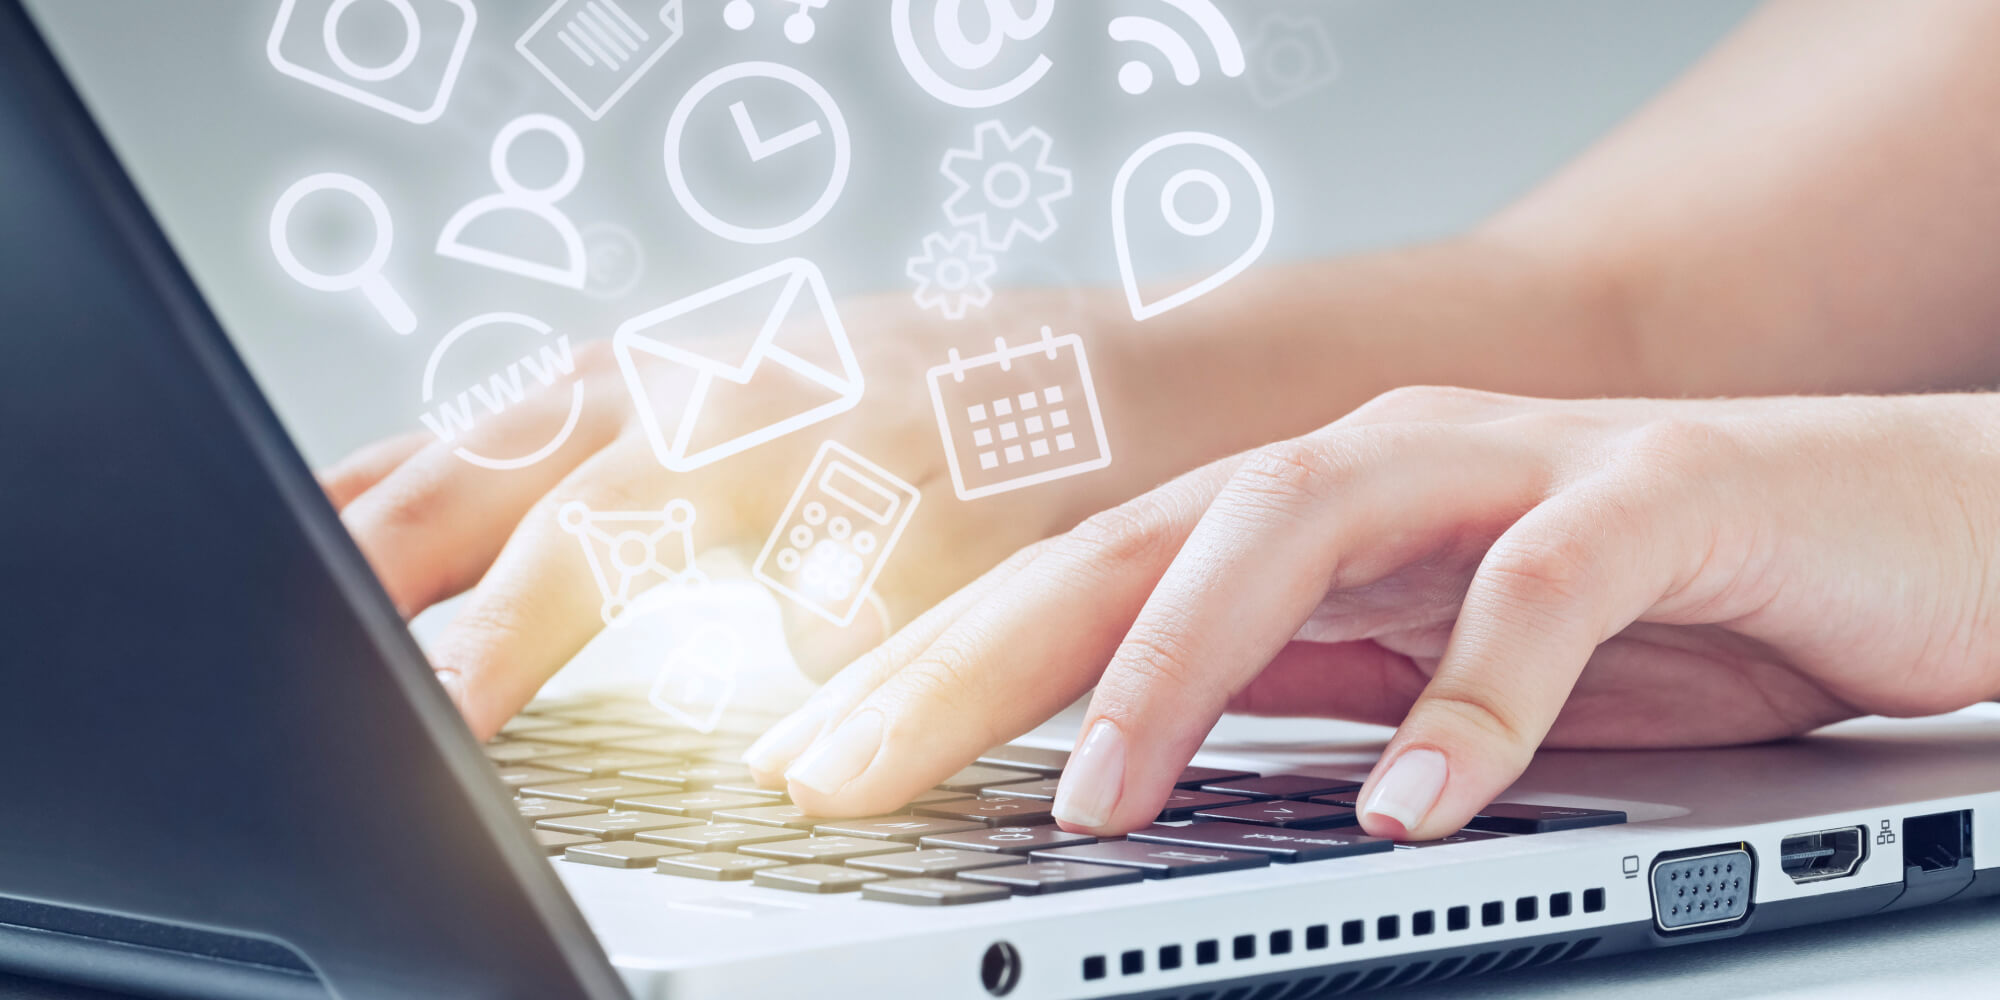 As vantagens de ter controle no acesso à internet